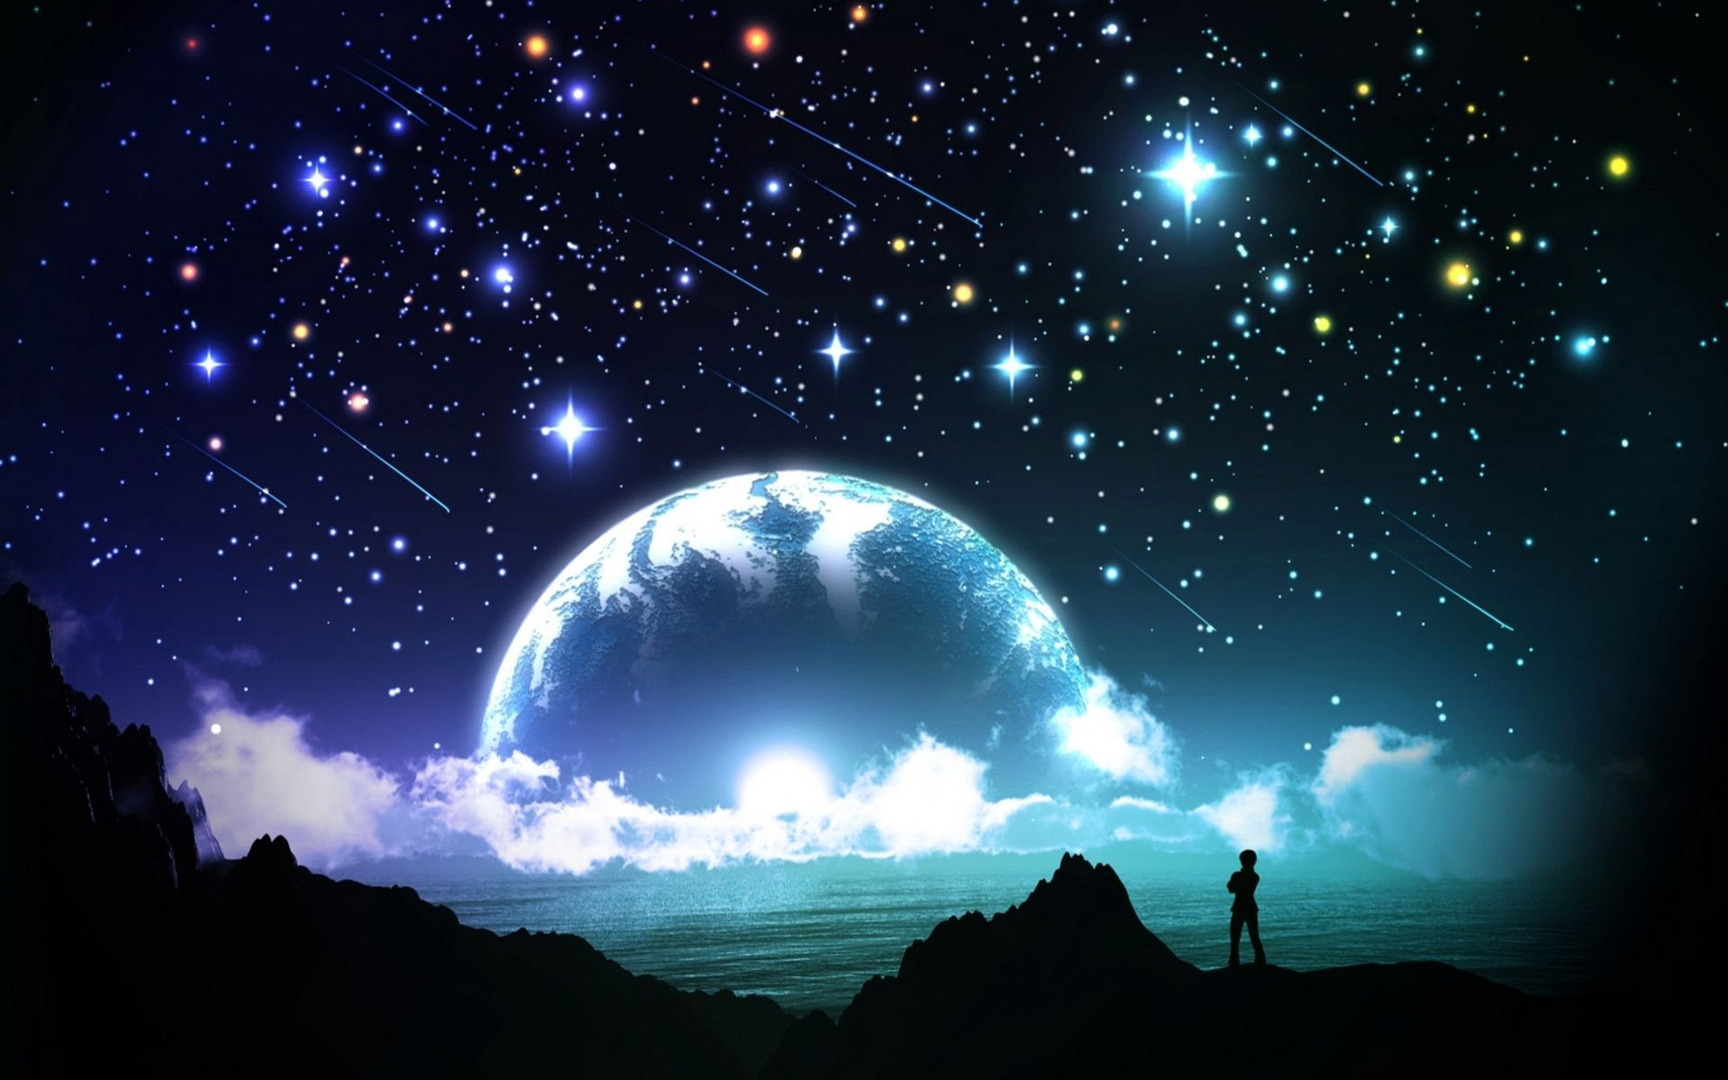 Download Bright night sky wallpaper 1728x1080